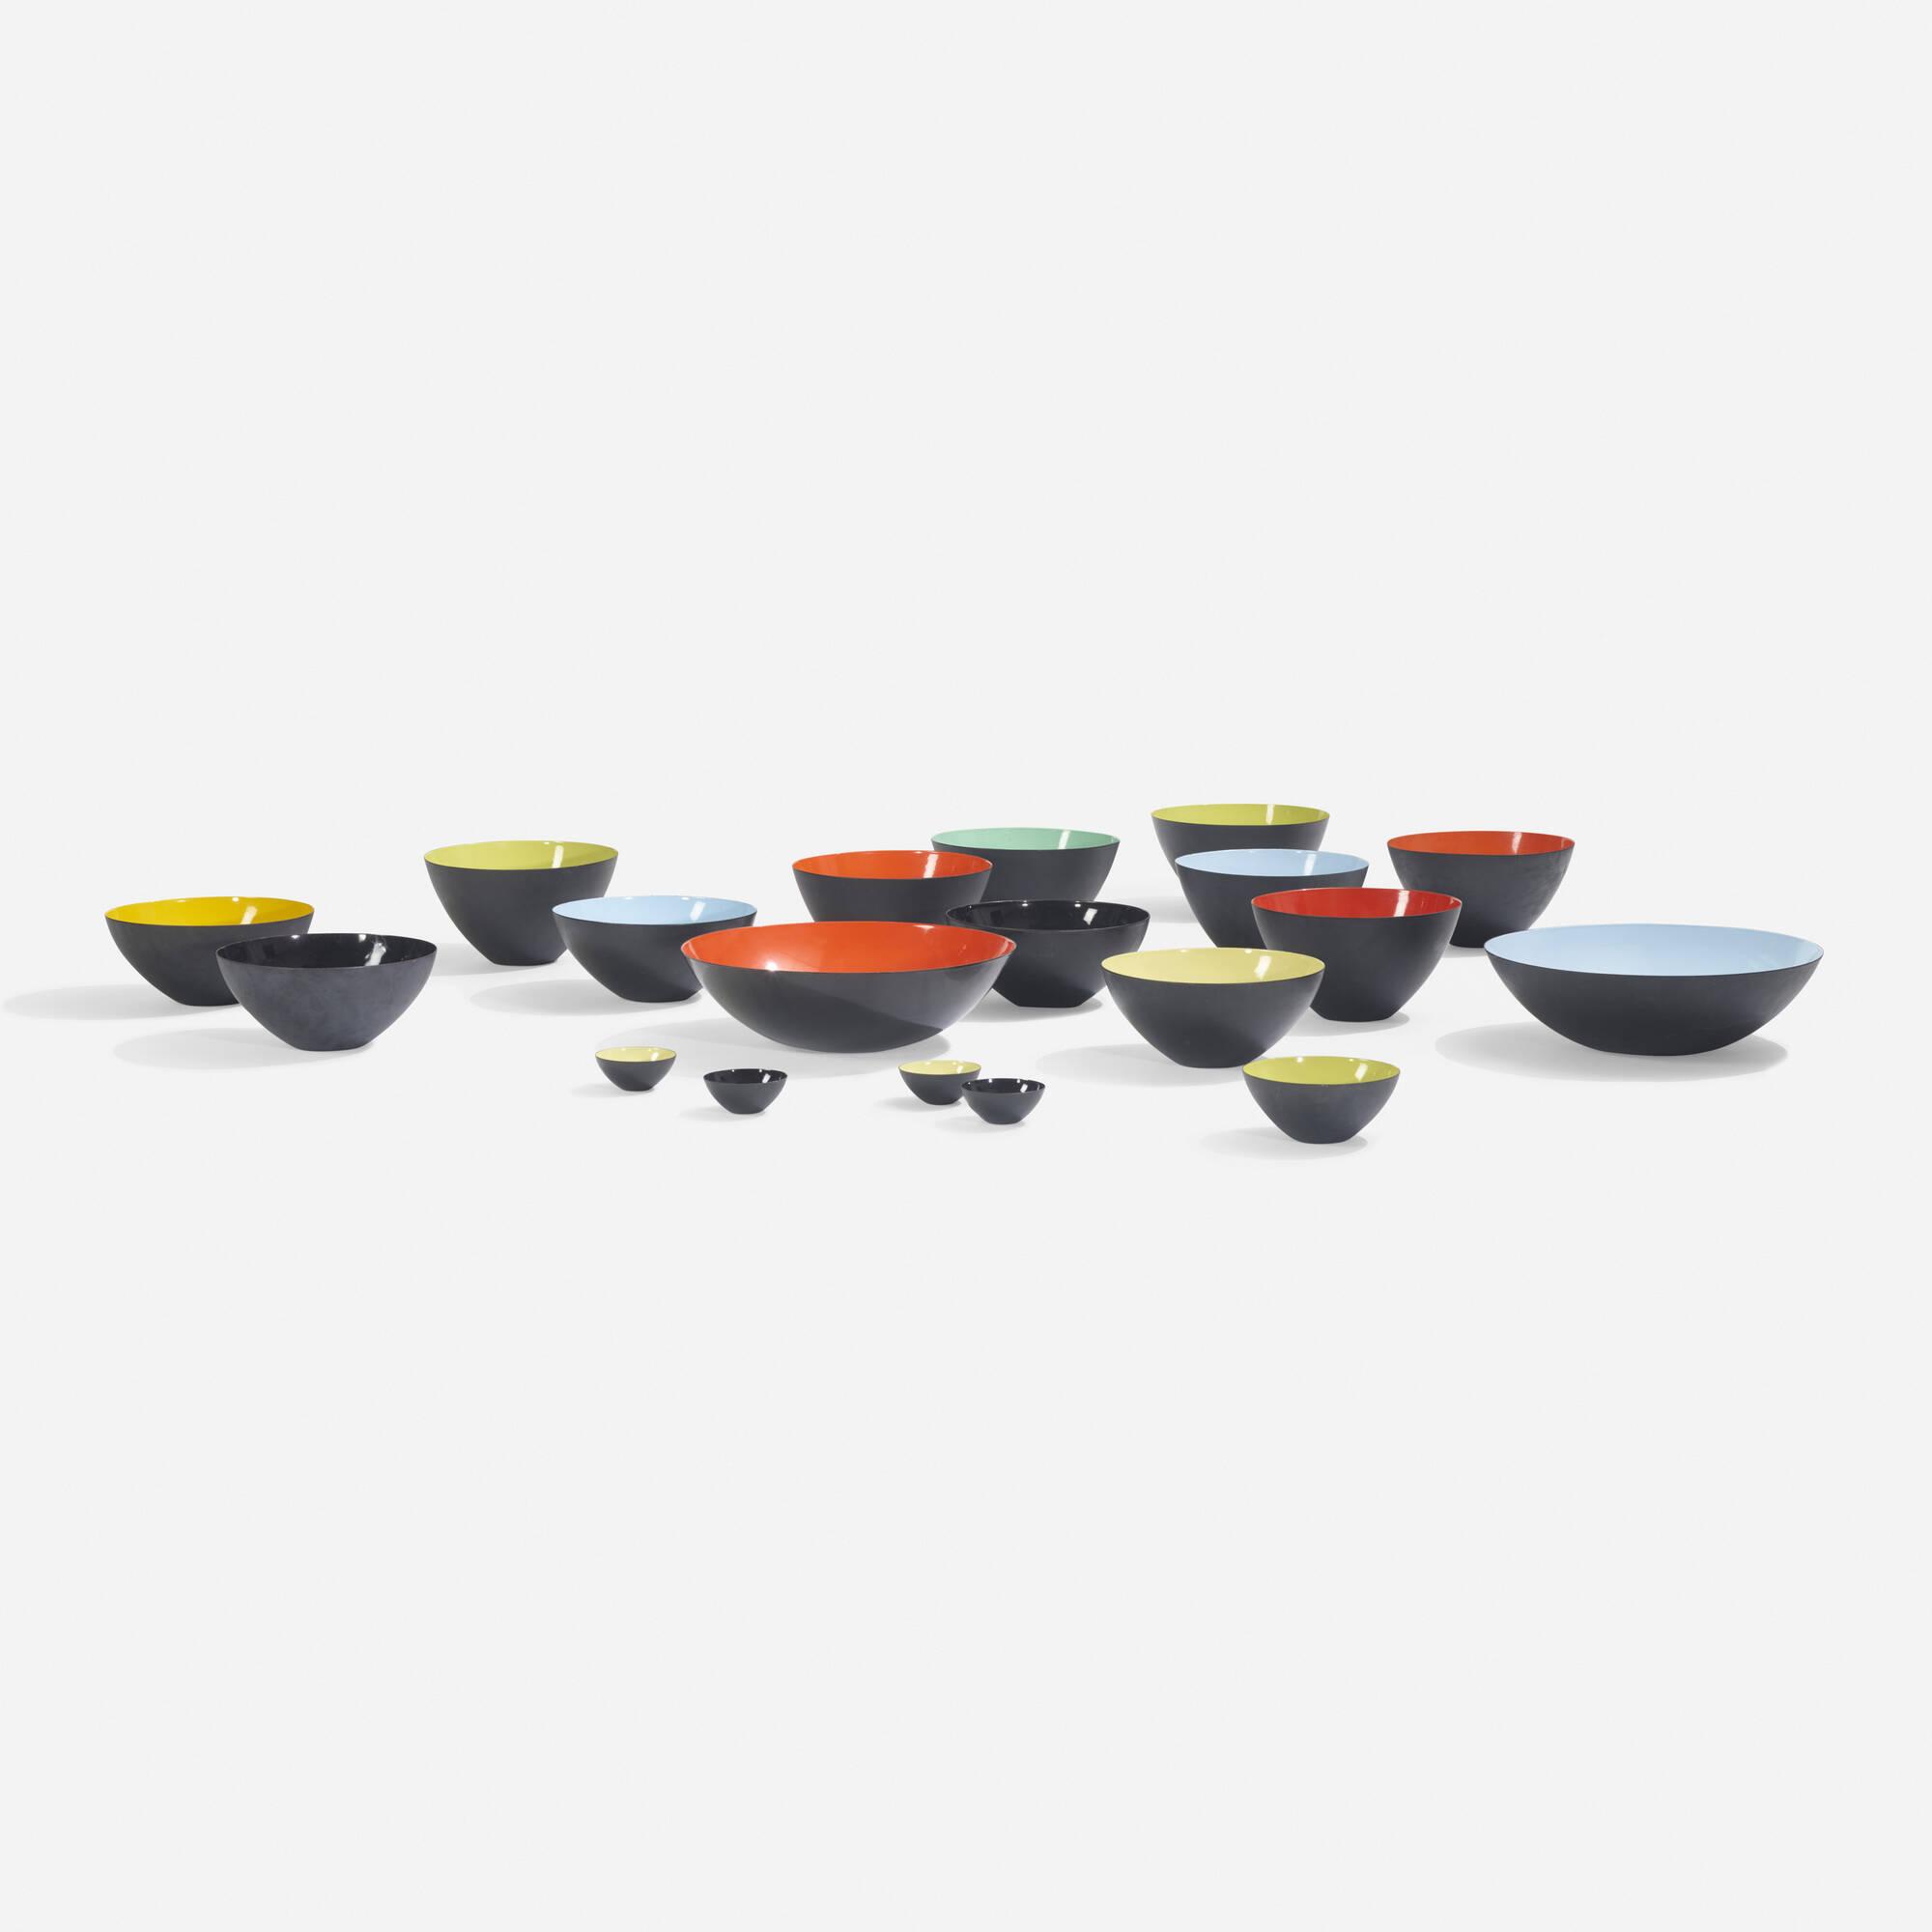 192: Herbert Krenchel / collection of nineteen Krenit bowls (1 of 3)